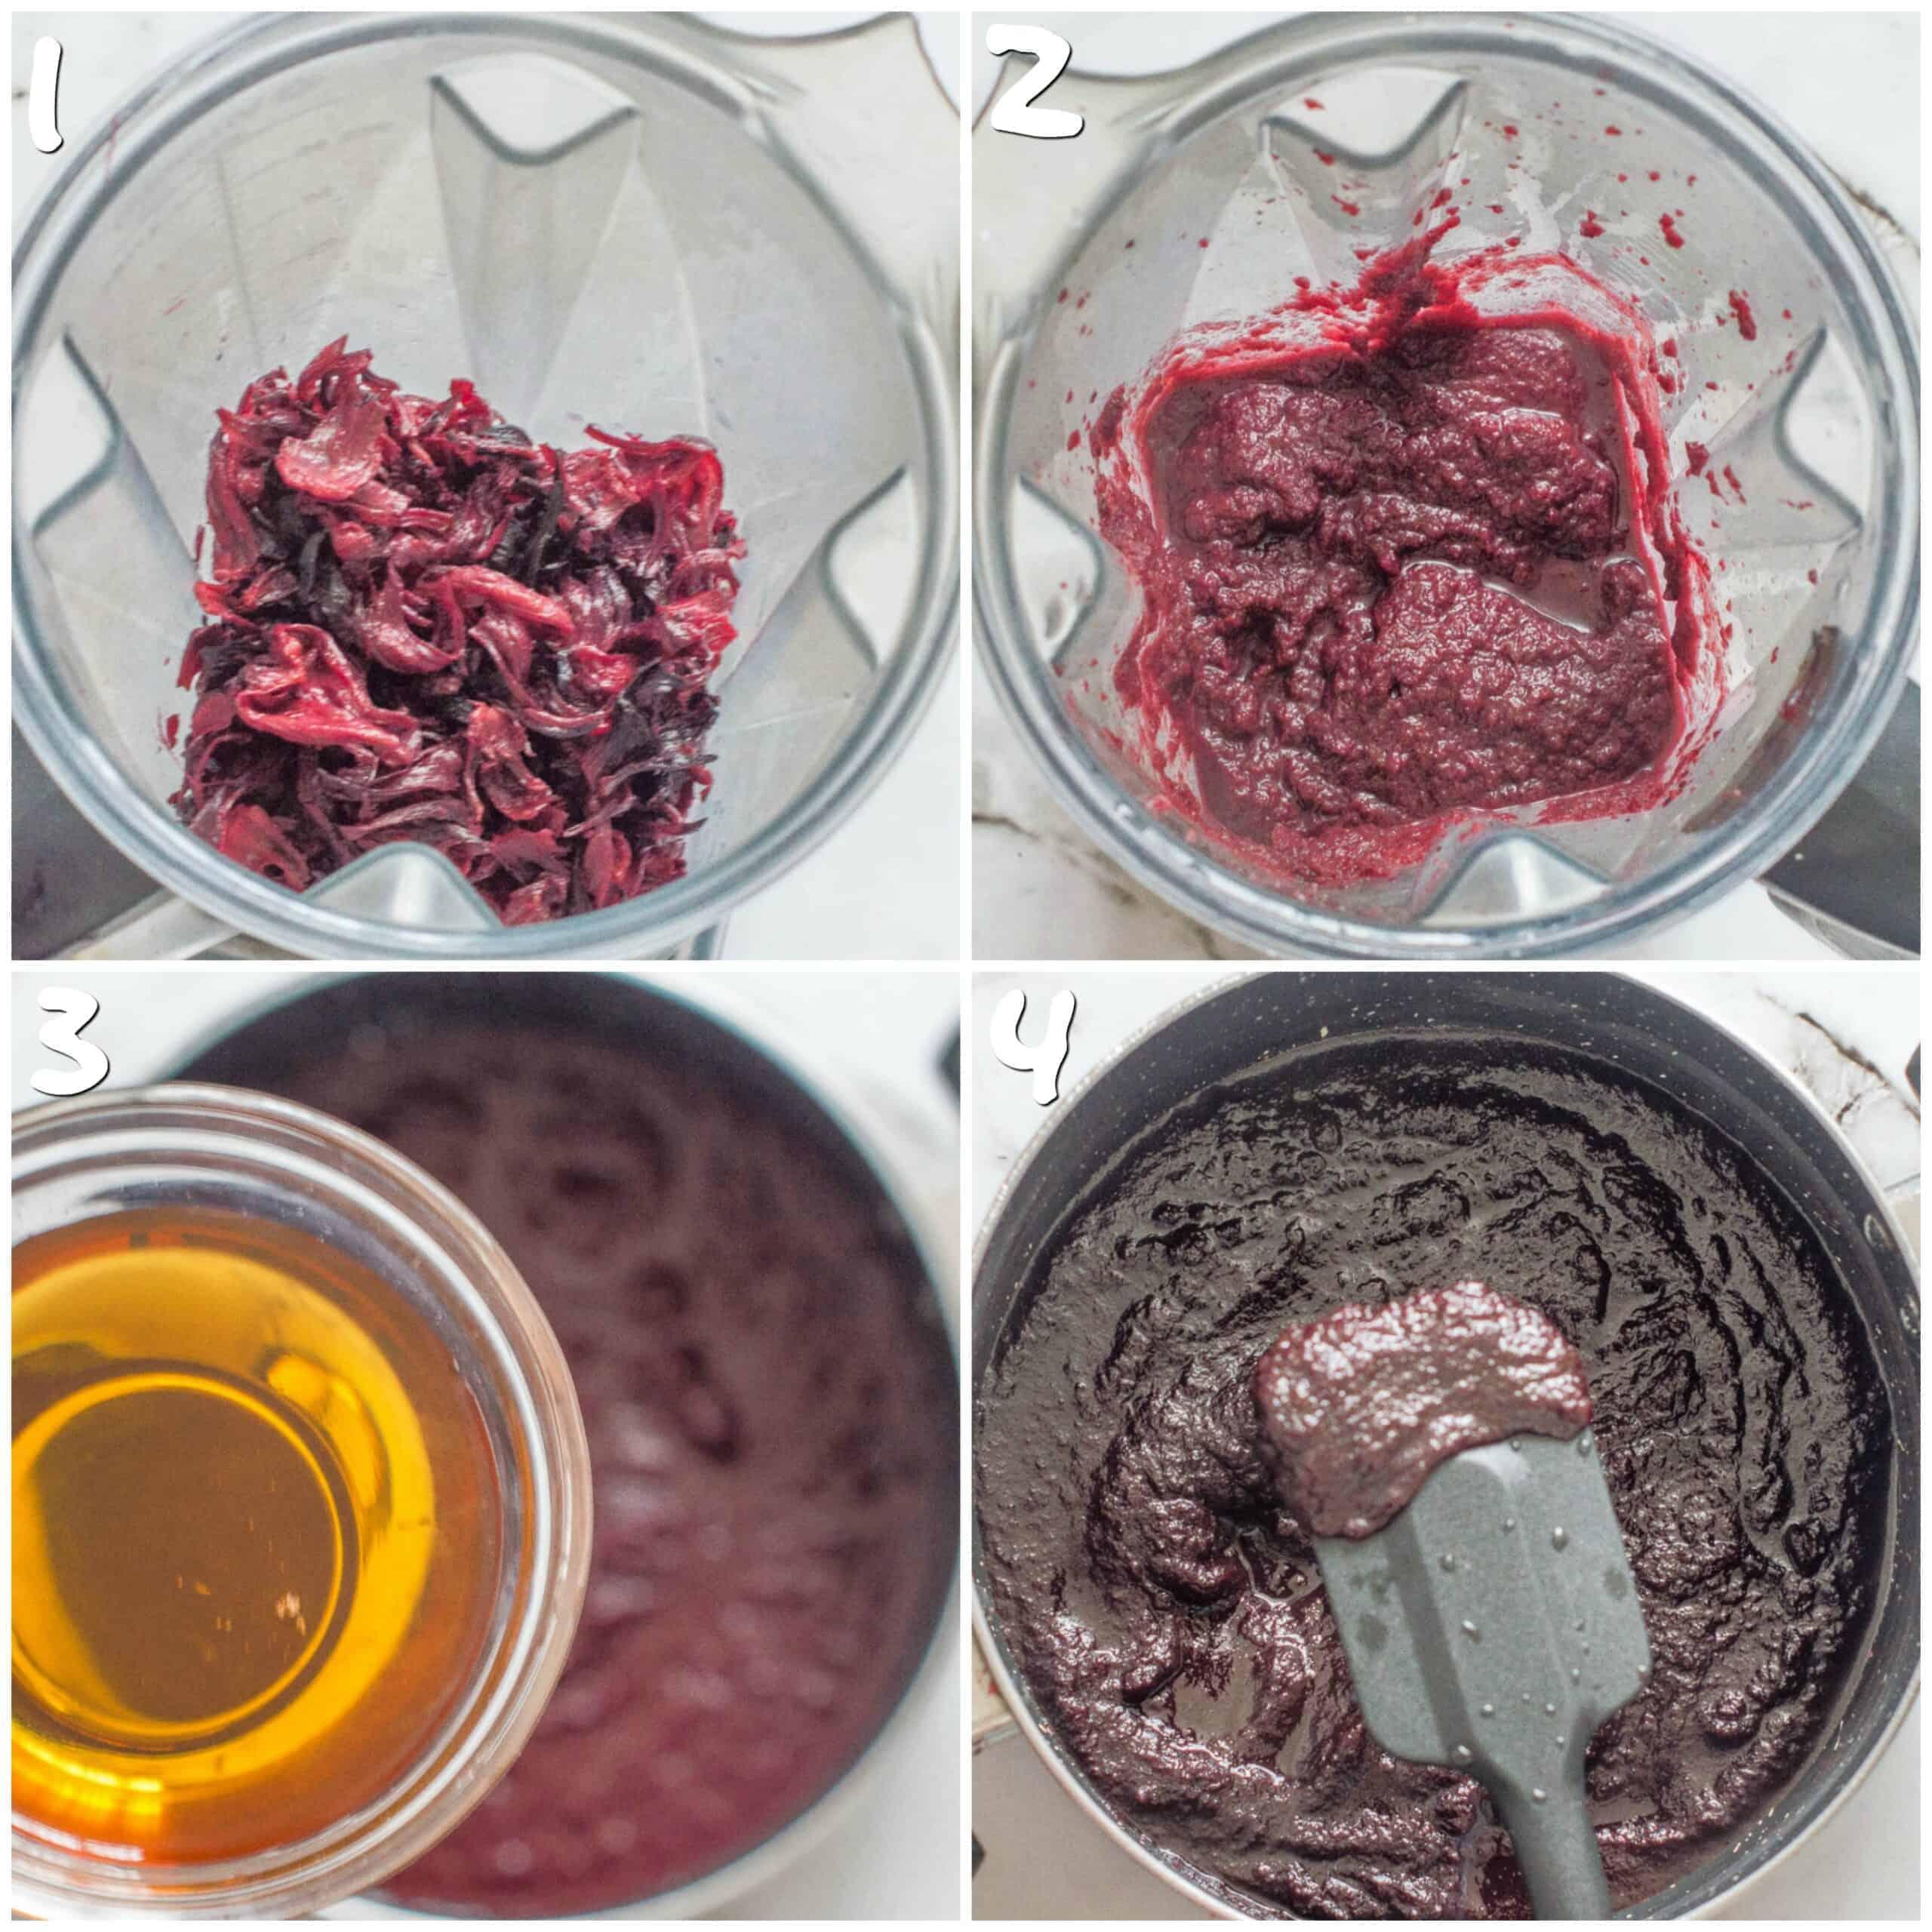 steps1-4 making the jam